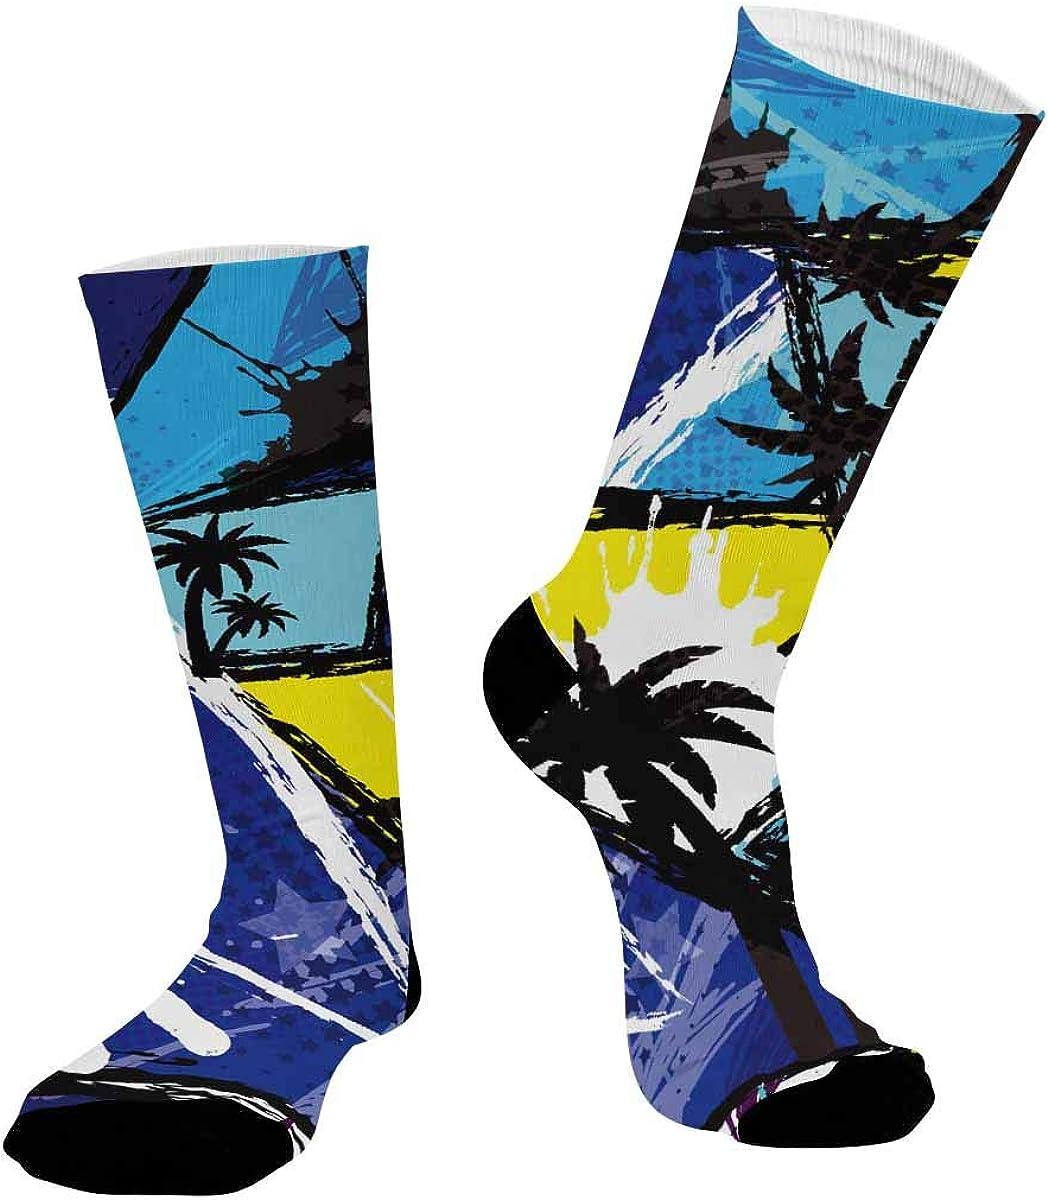 INTERESTPRINT Unisex Sublimated Crew Socks Athletic Running Socks Abstract Geometric Elements, Palm